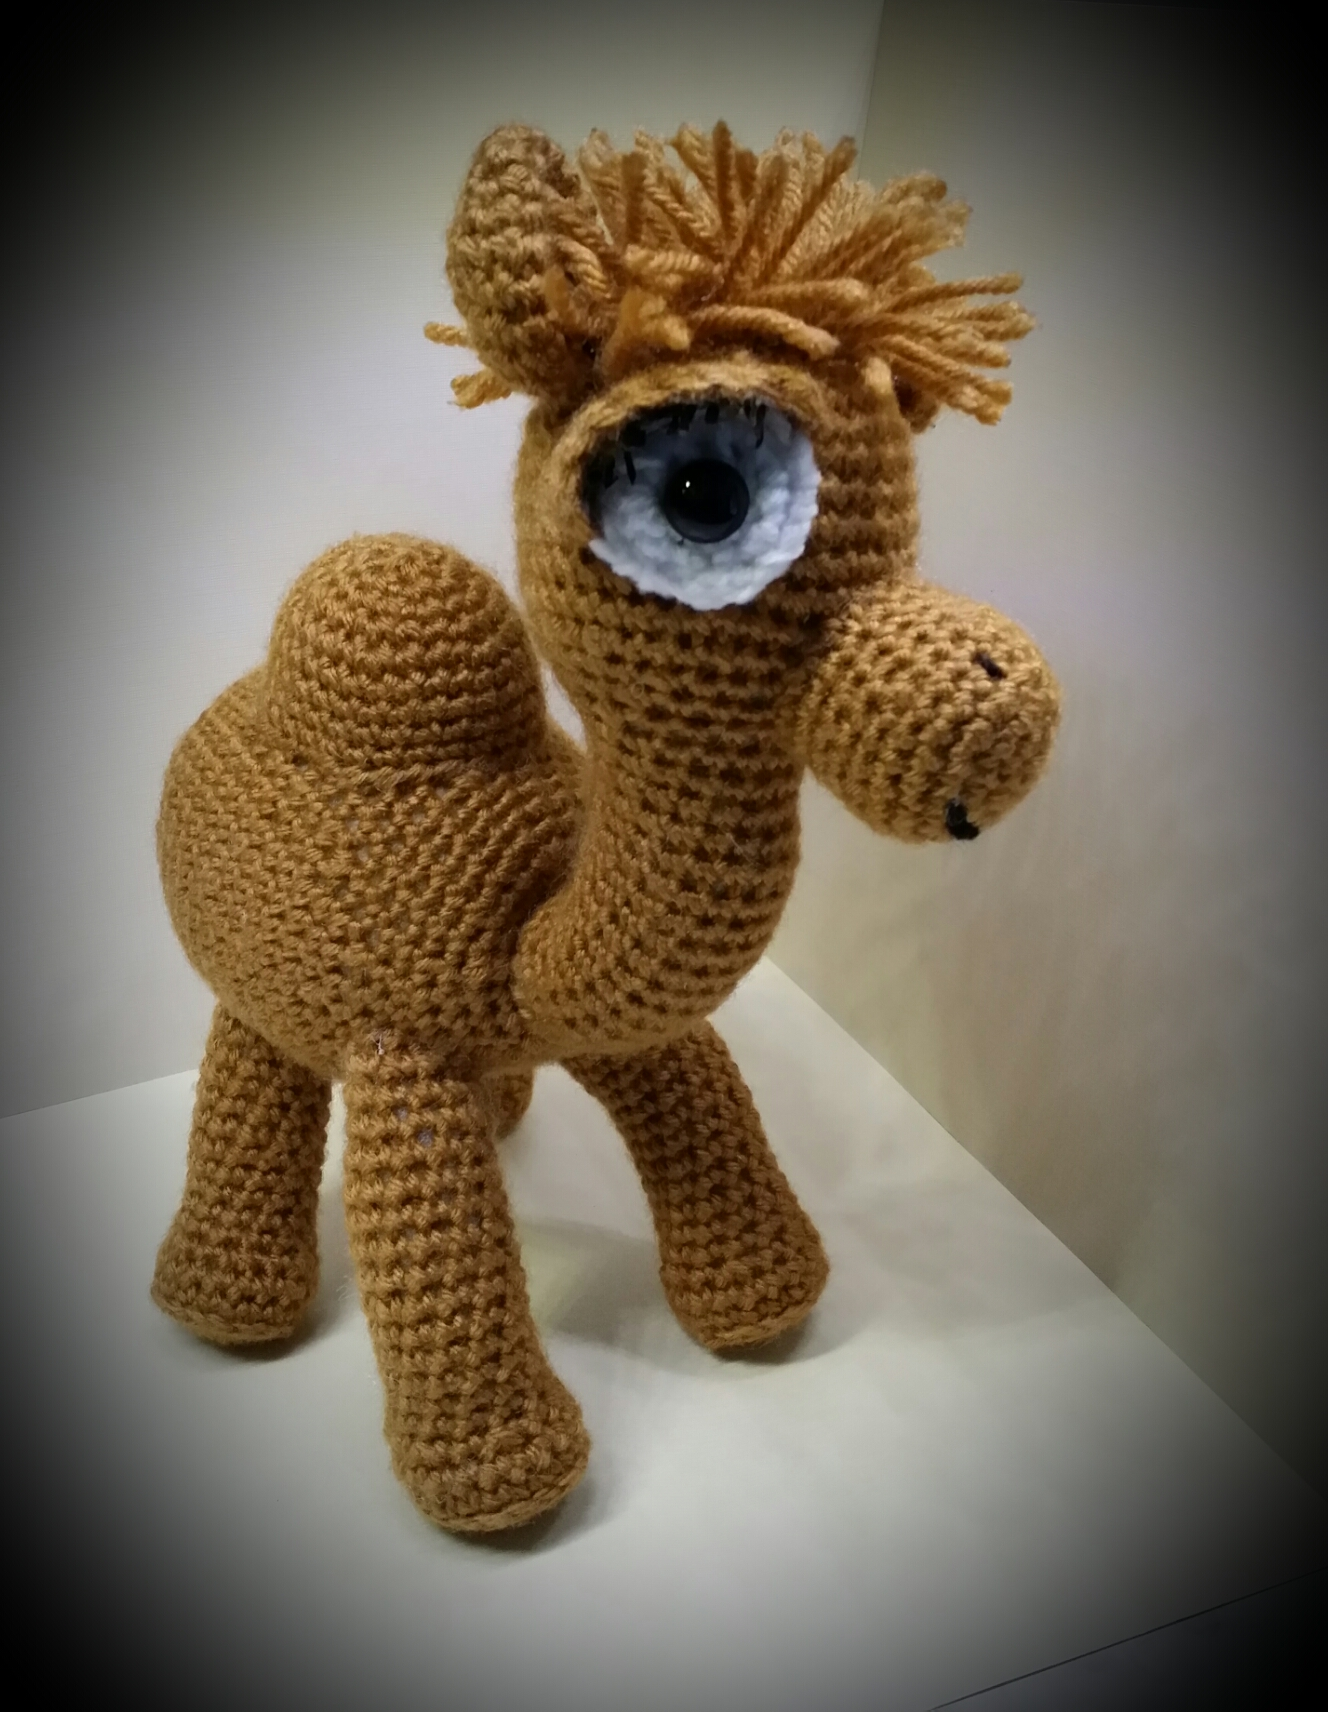 Crochet Camel Stuffed Animal 183 Jatdesigns 183 Online Store